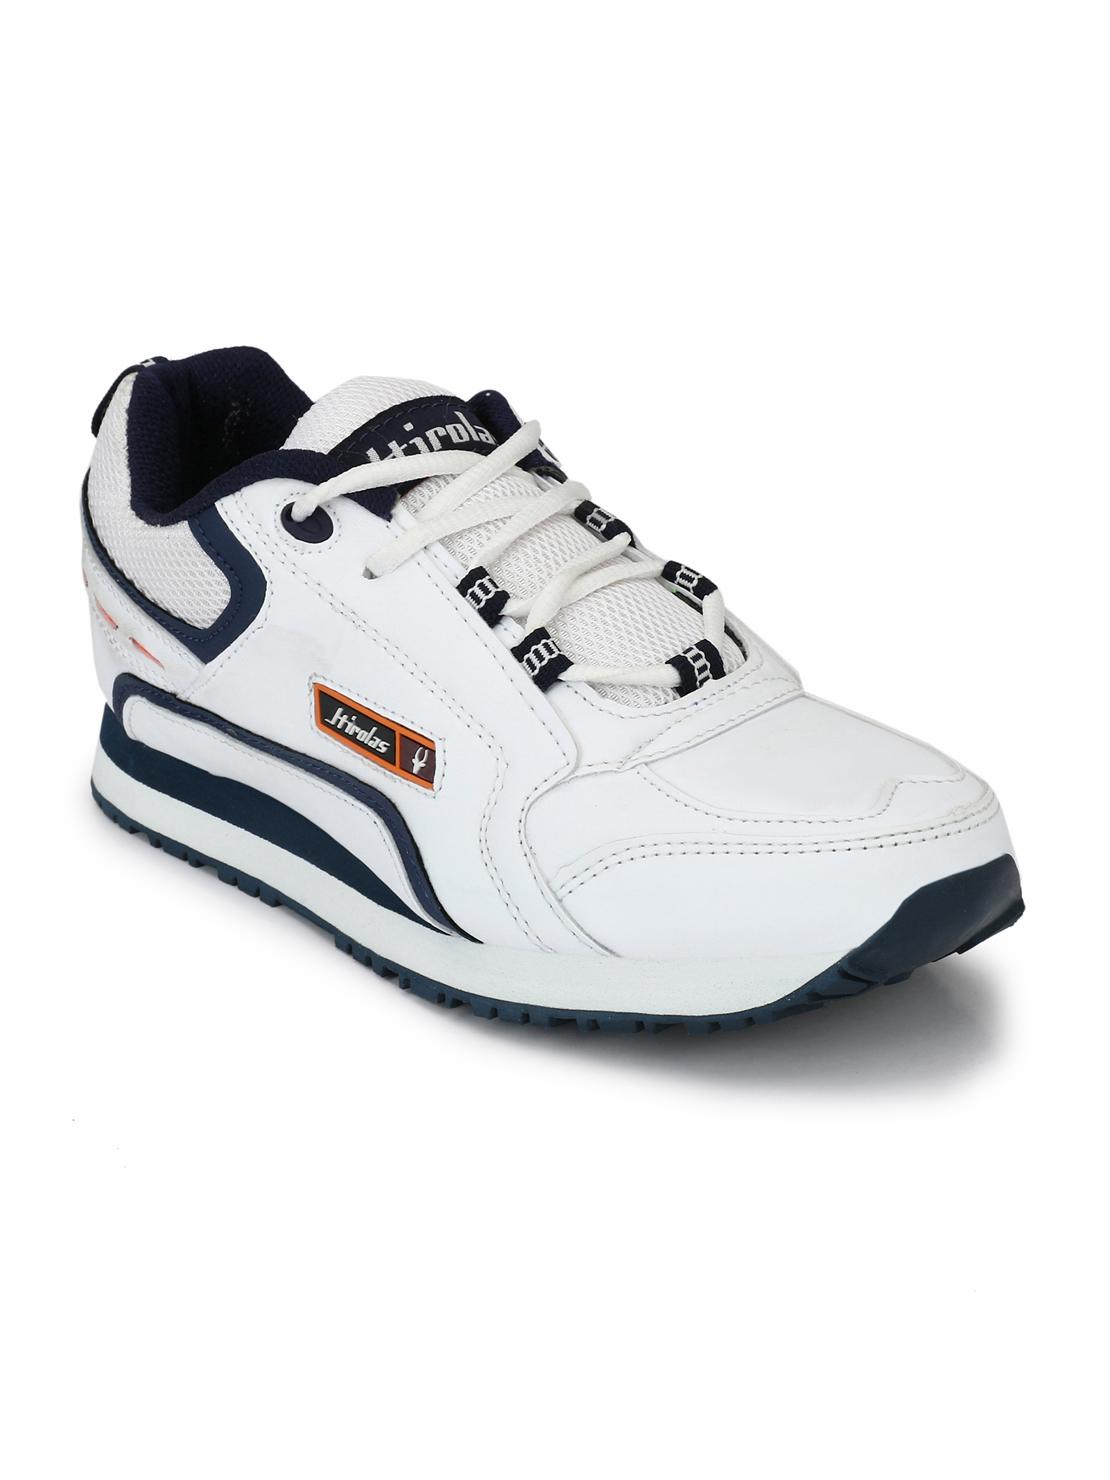 Hirolas   Hirolas Men's Multisport Sneaker Shoes- White